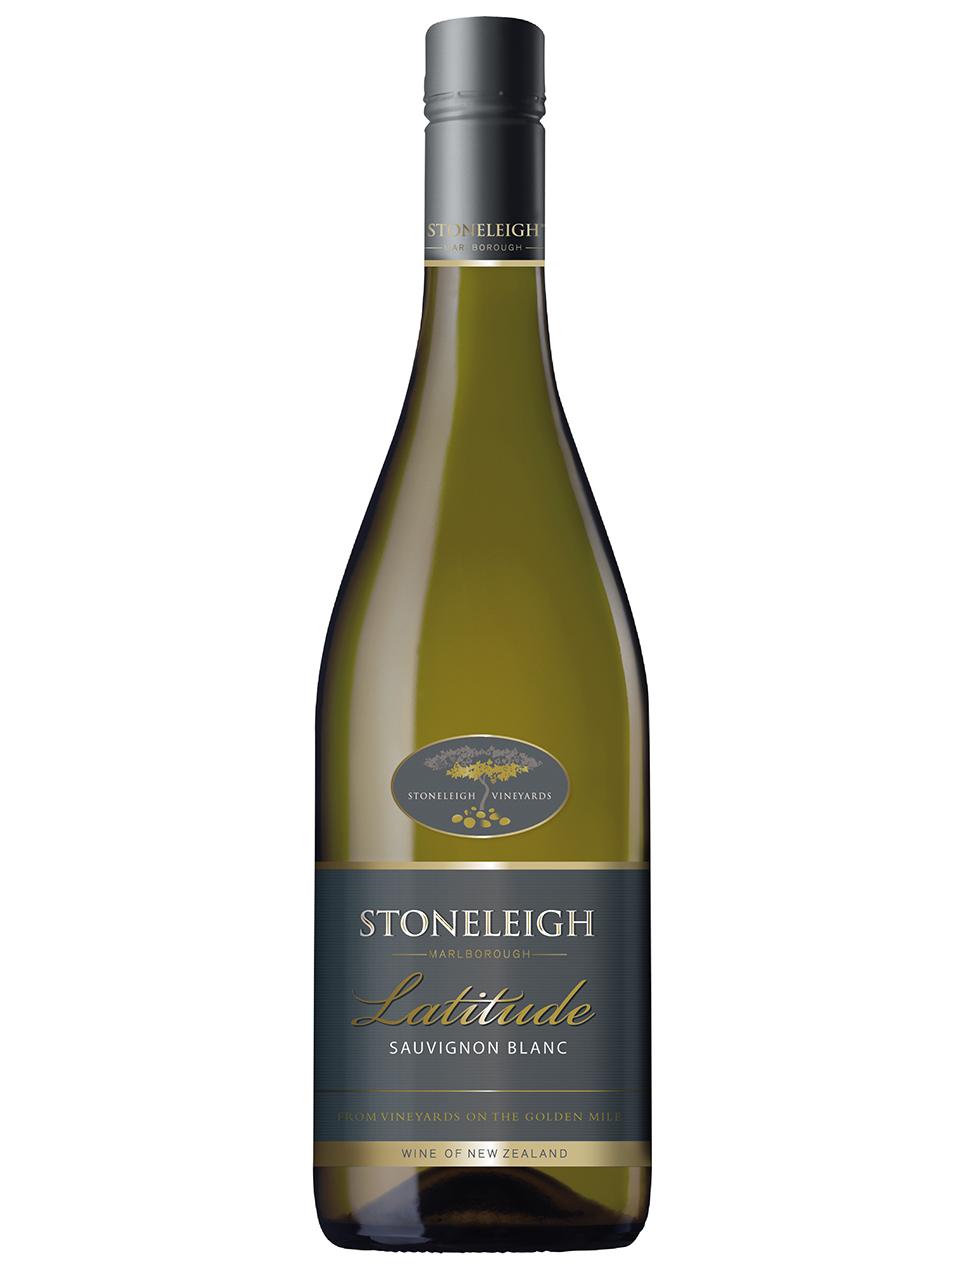 Stoneleigh Latitude Marlborough Sauvignon Blanc